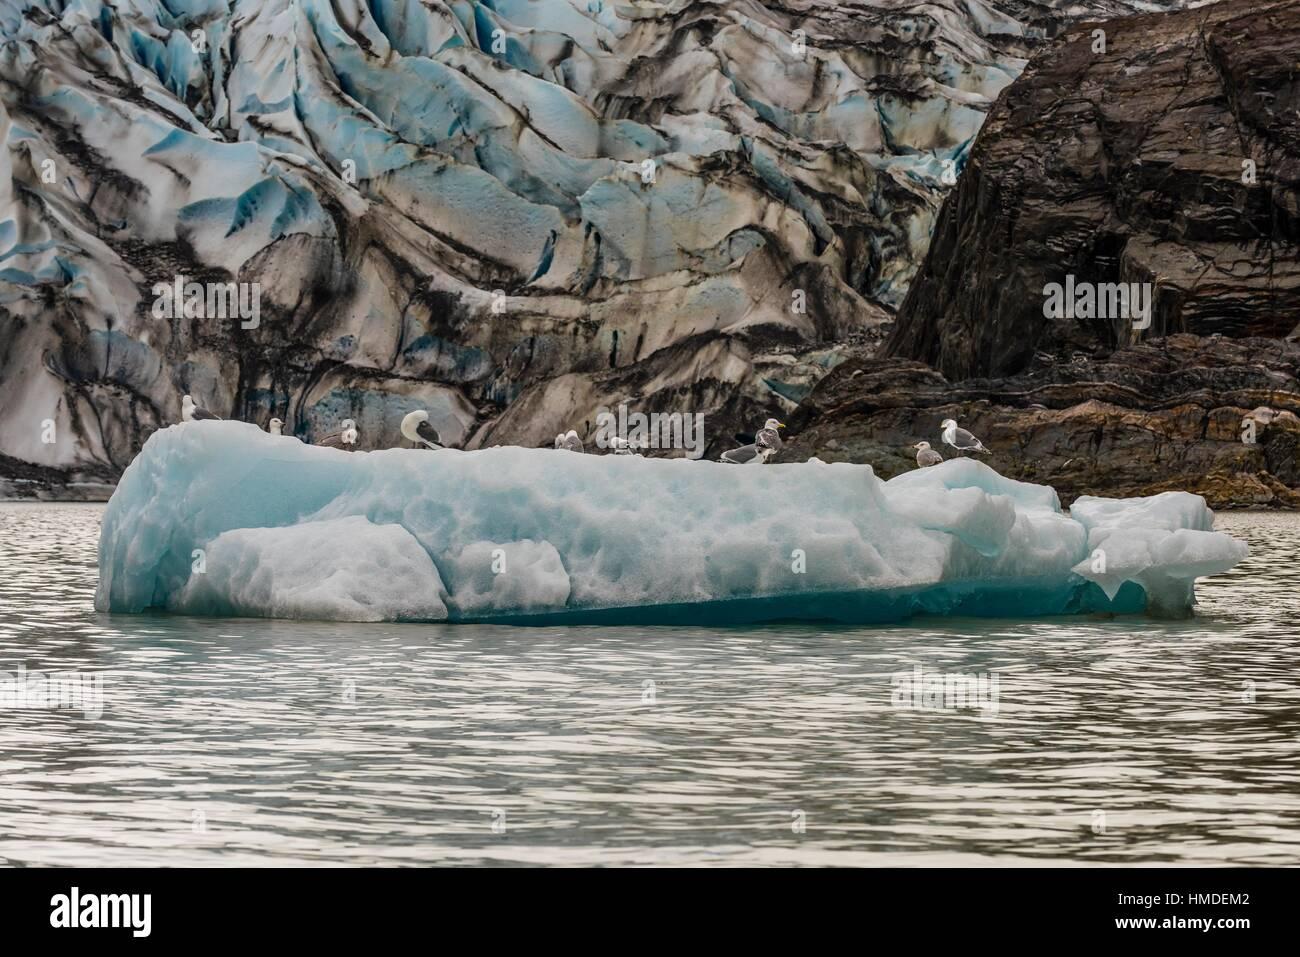 Glaucous-winged gulls on a piece of floating ice, Mendenhall Lake, Juneau, Alaska USA. - Stock Image